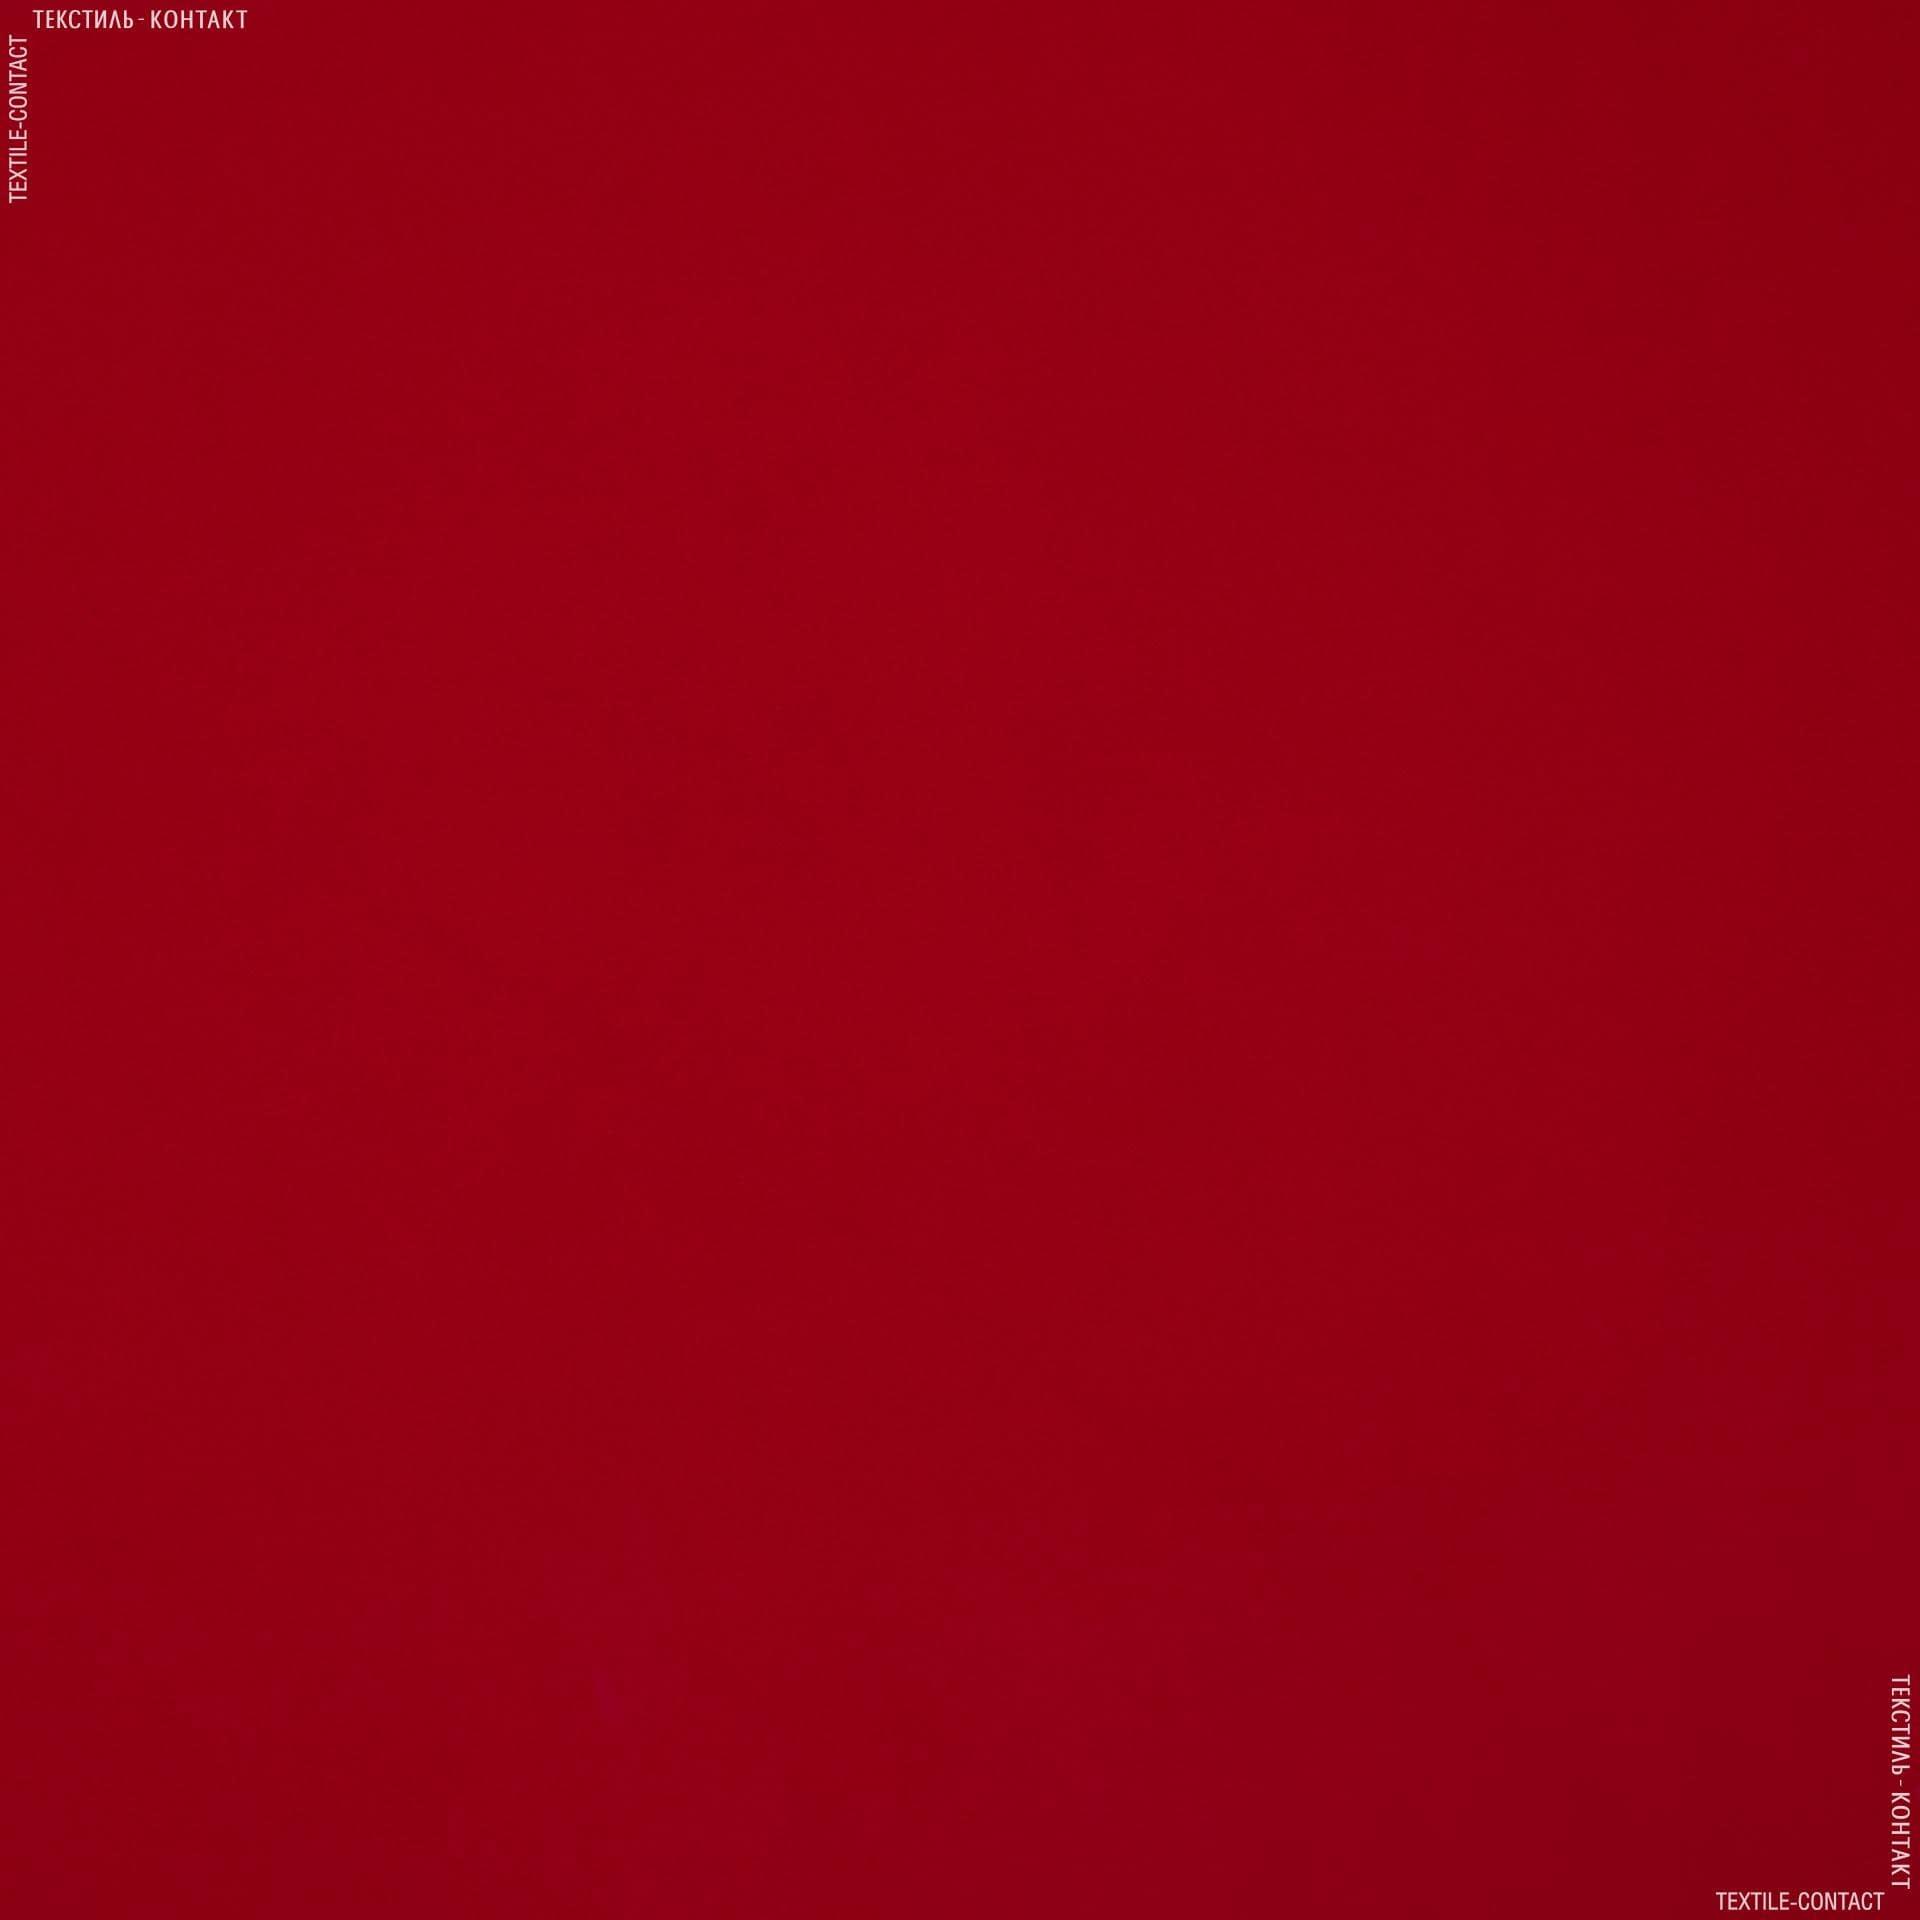 Ткани ритуальная ткань - Замша искусственная красный